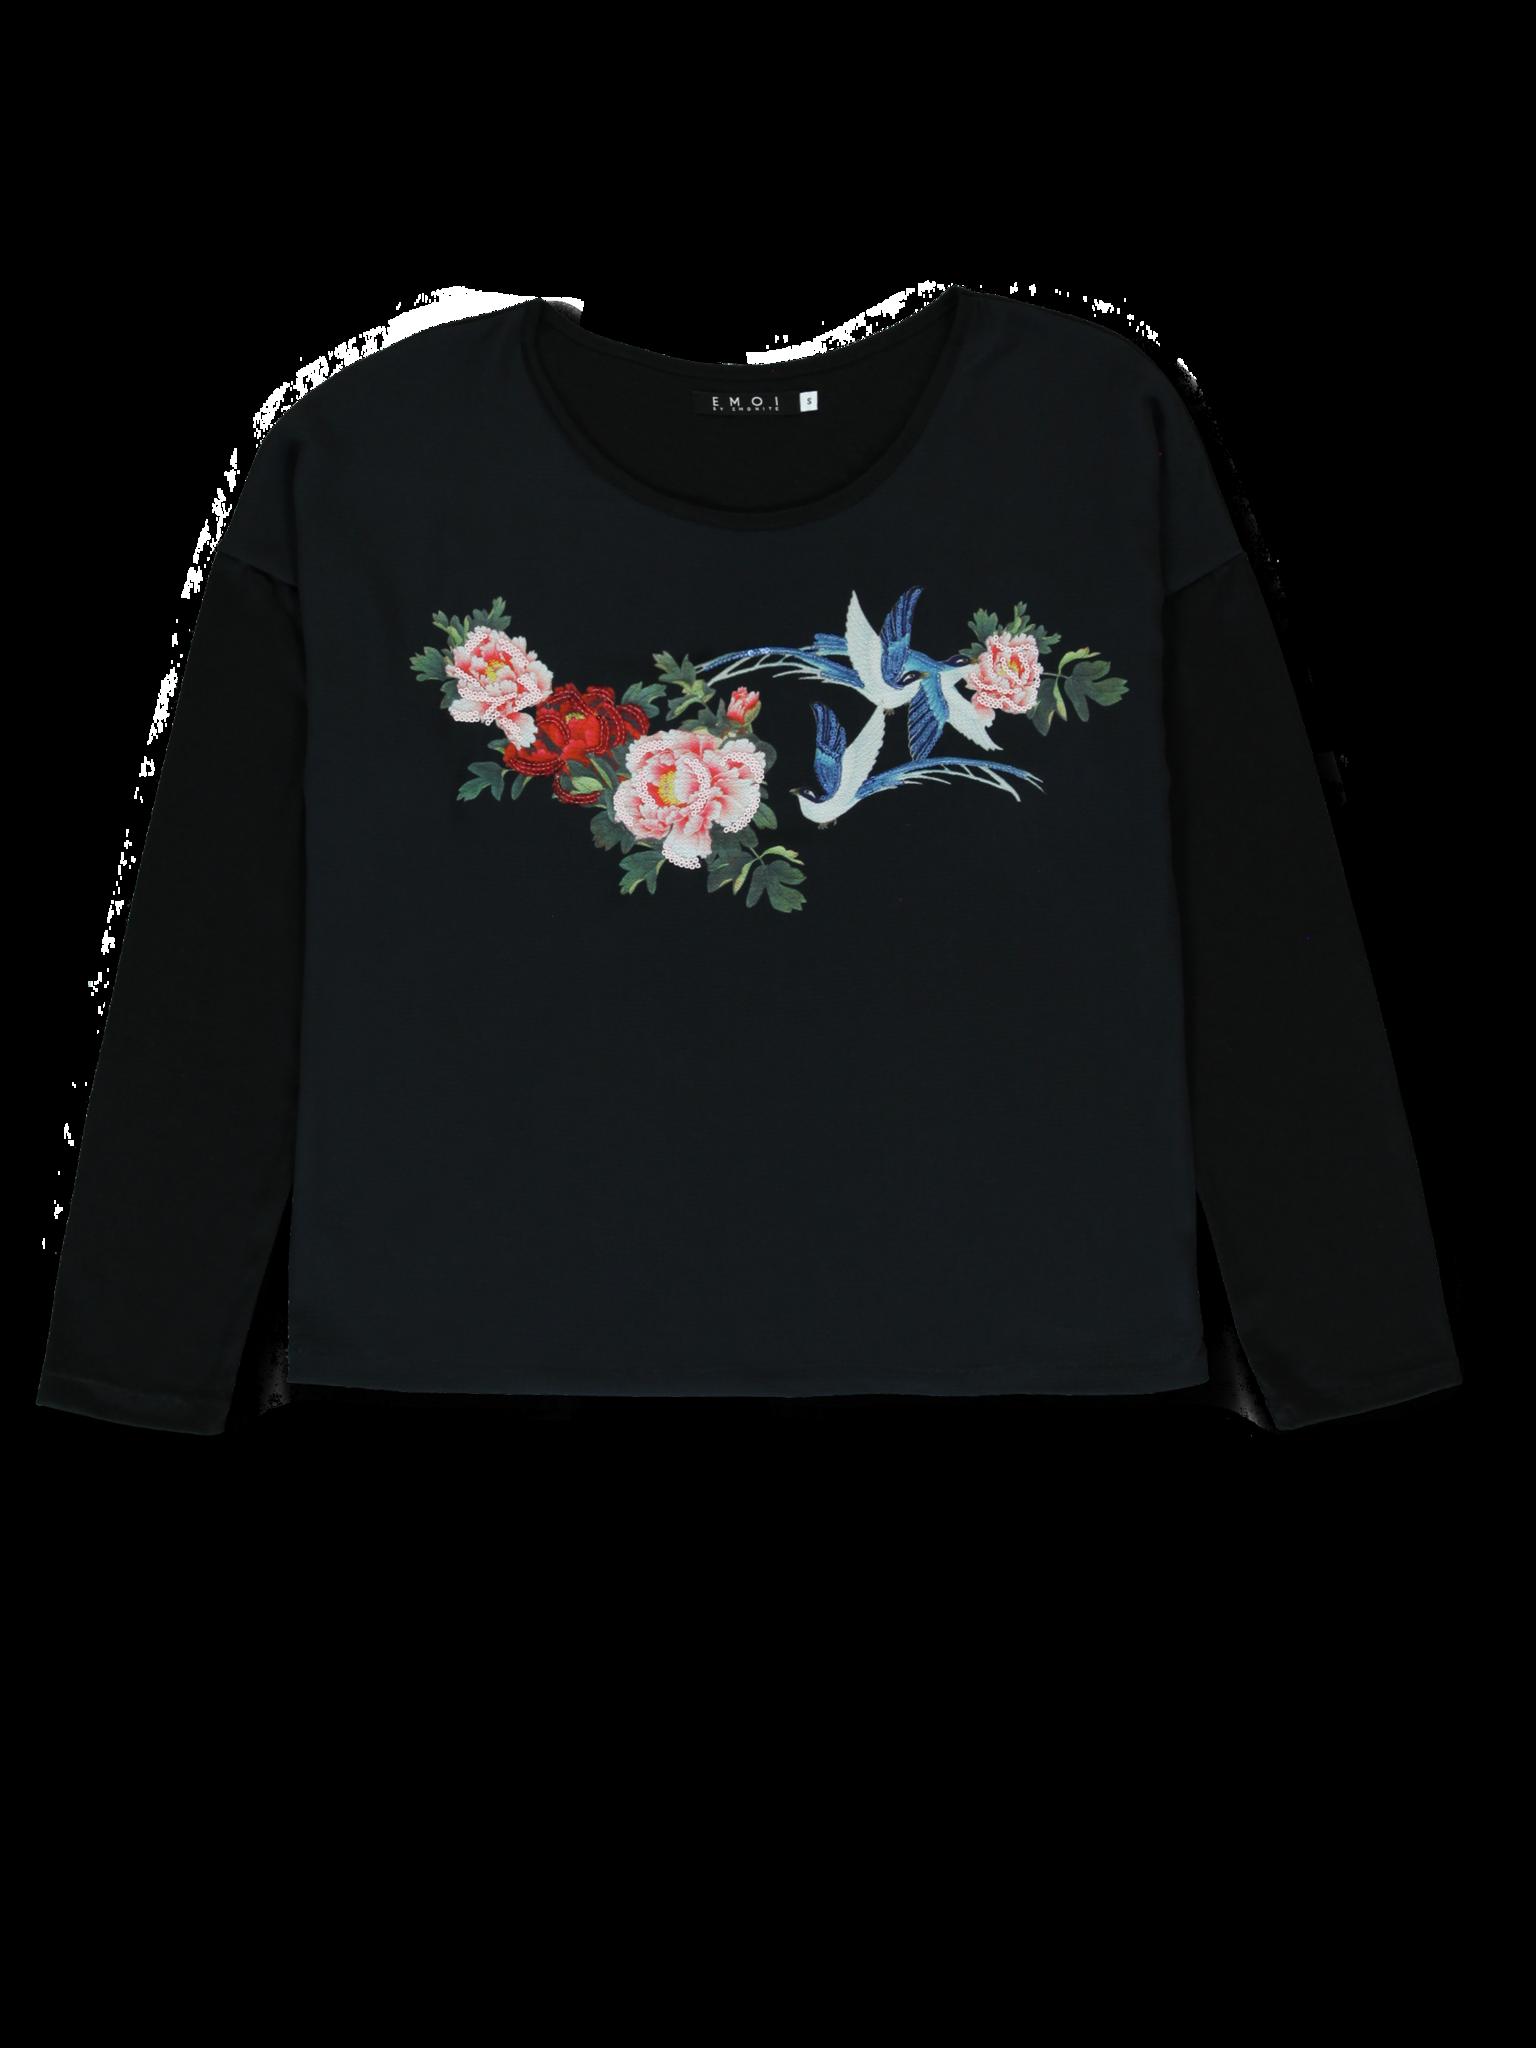 Emoi | Winter 2019 Ladies | T-shirt | 24 pcs/box